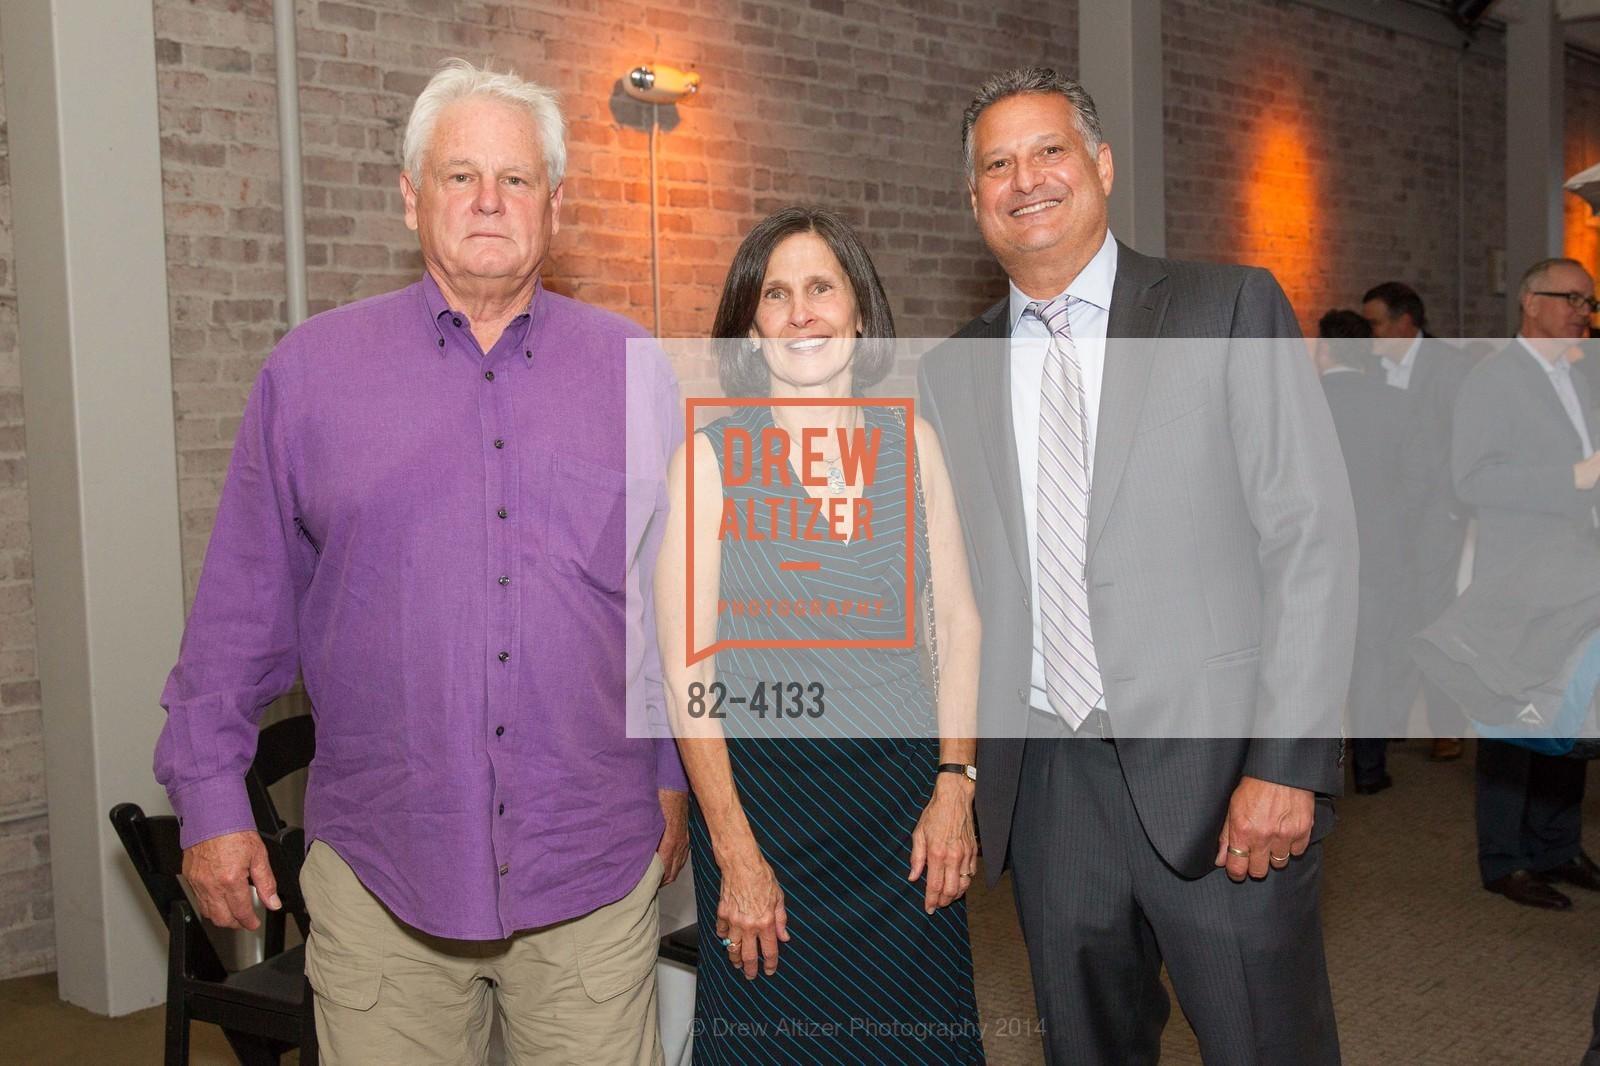 Jim Cochran, Carol Drace, Drew Goodman, Photo #82-4133